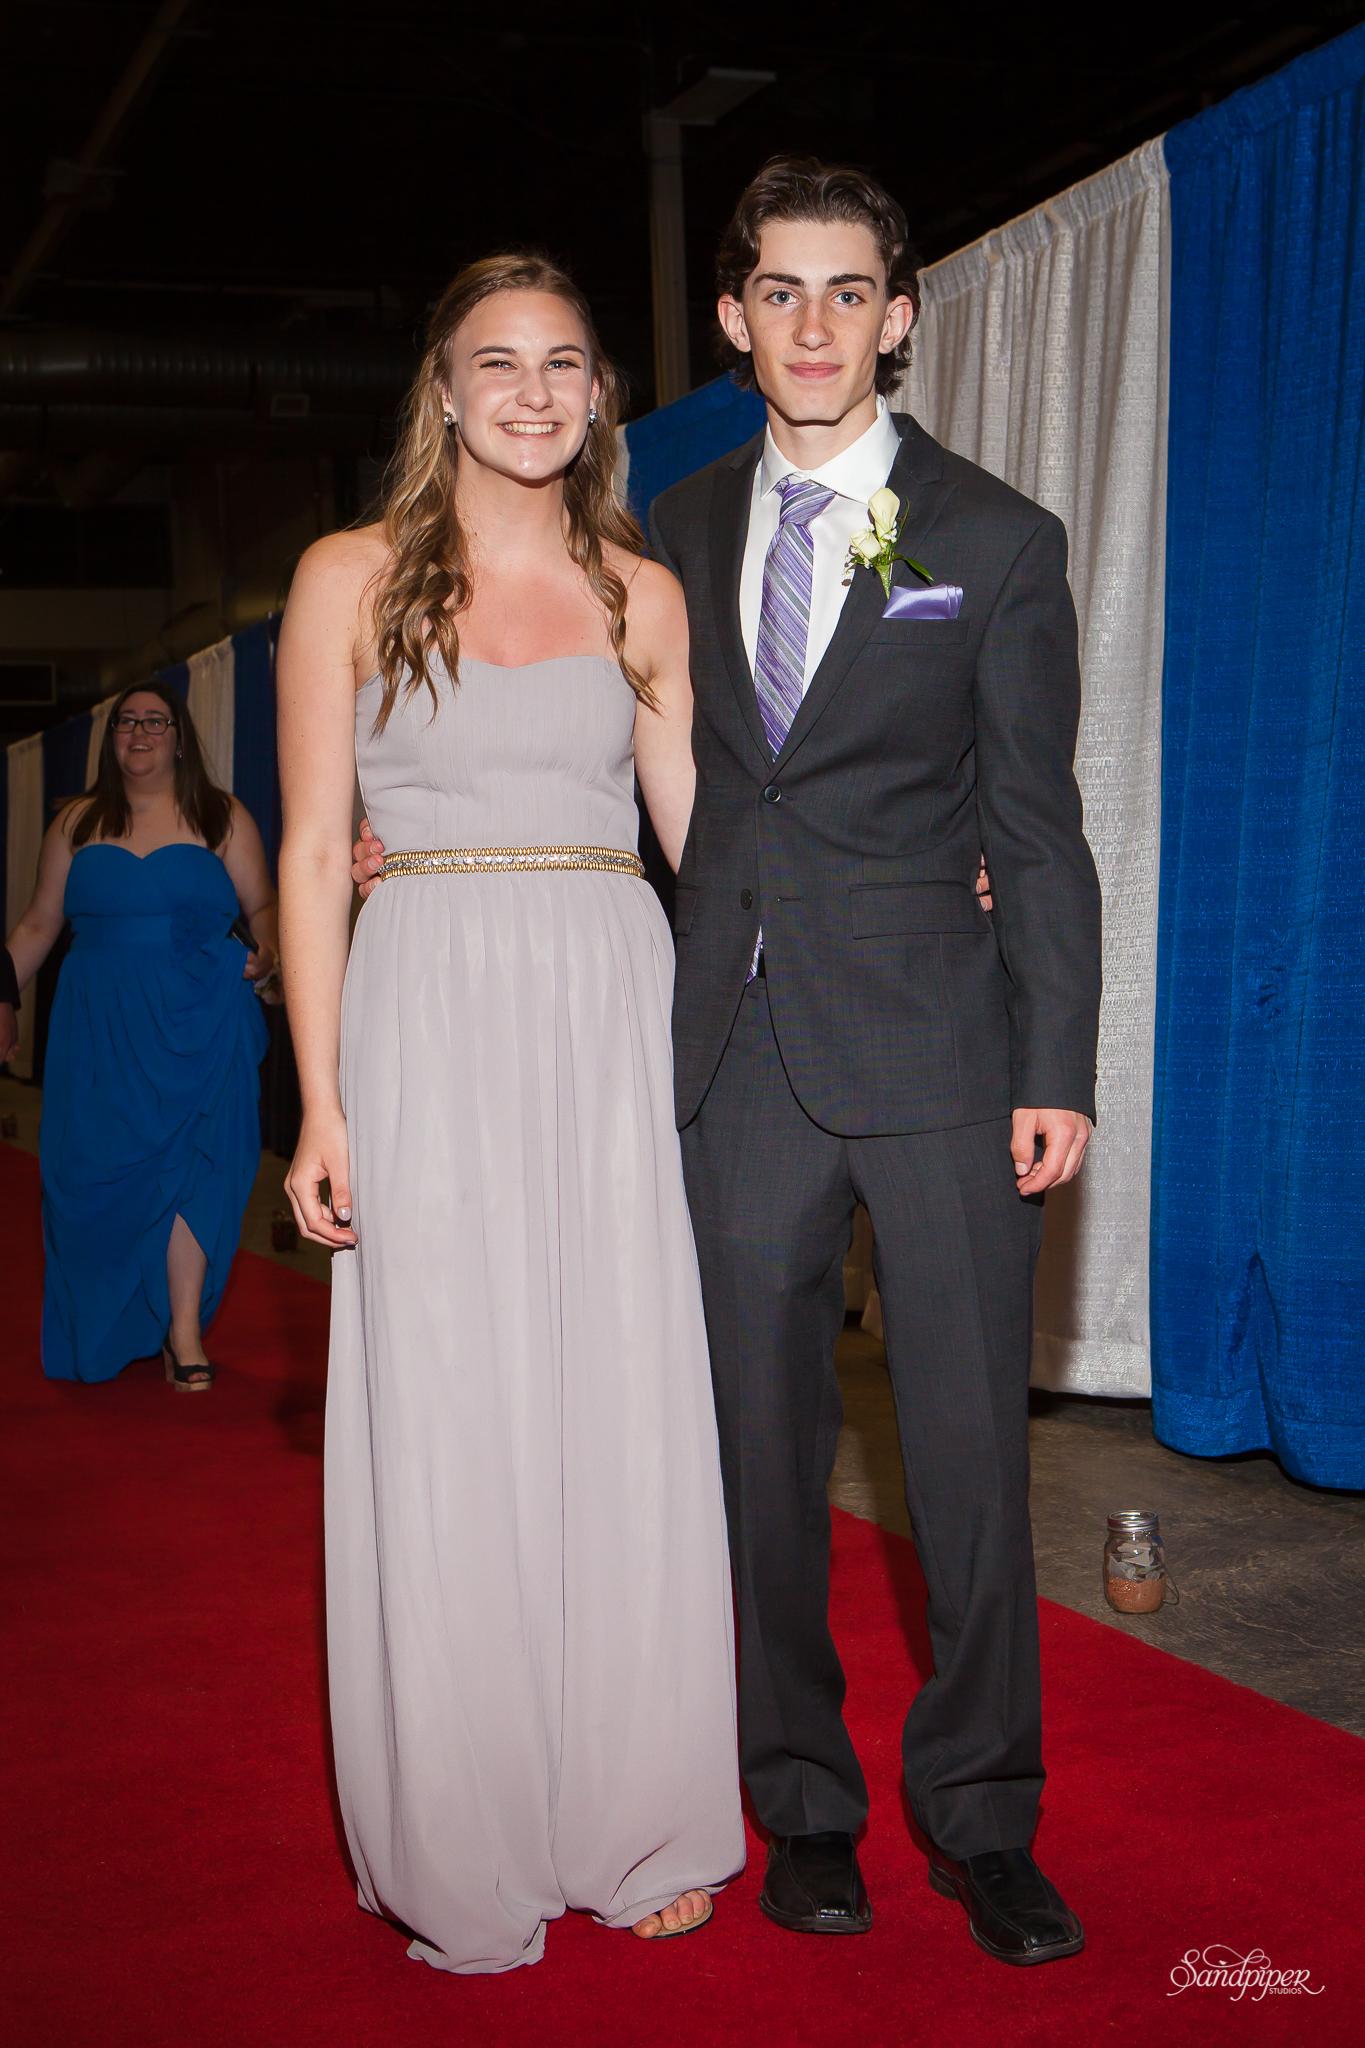 Bluefield Prom 2017 27